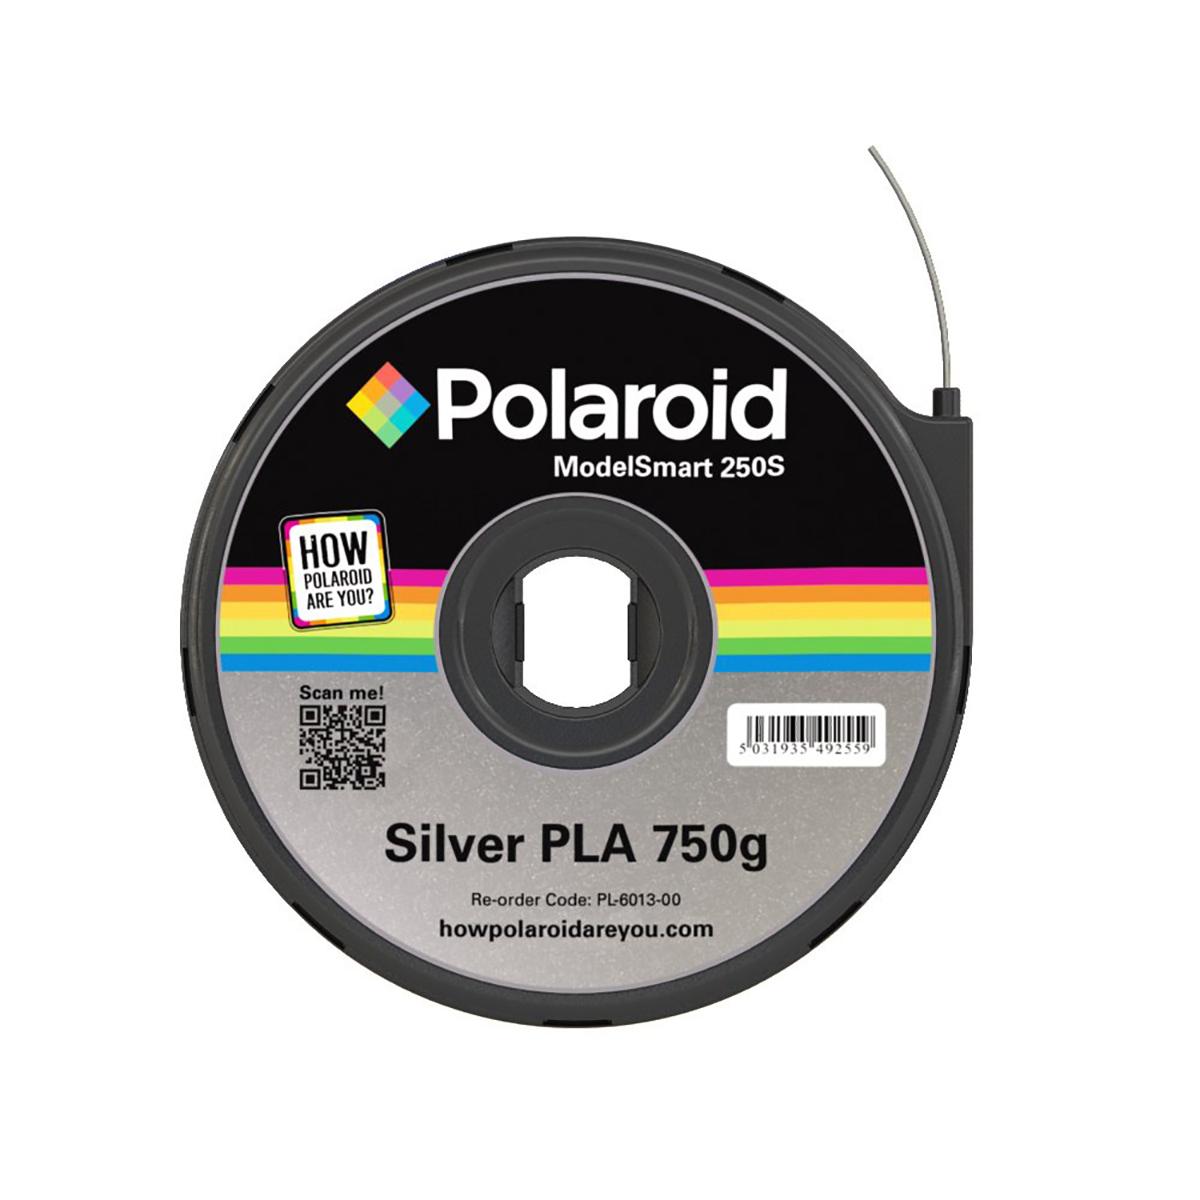 Polaroid ModelSmart 250S Silver Filament Cartridge - 750g